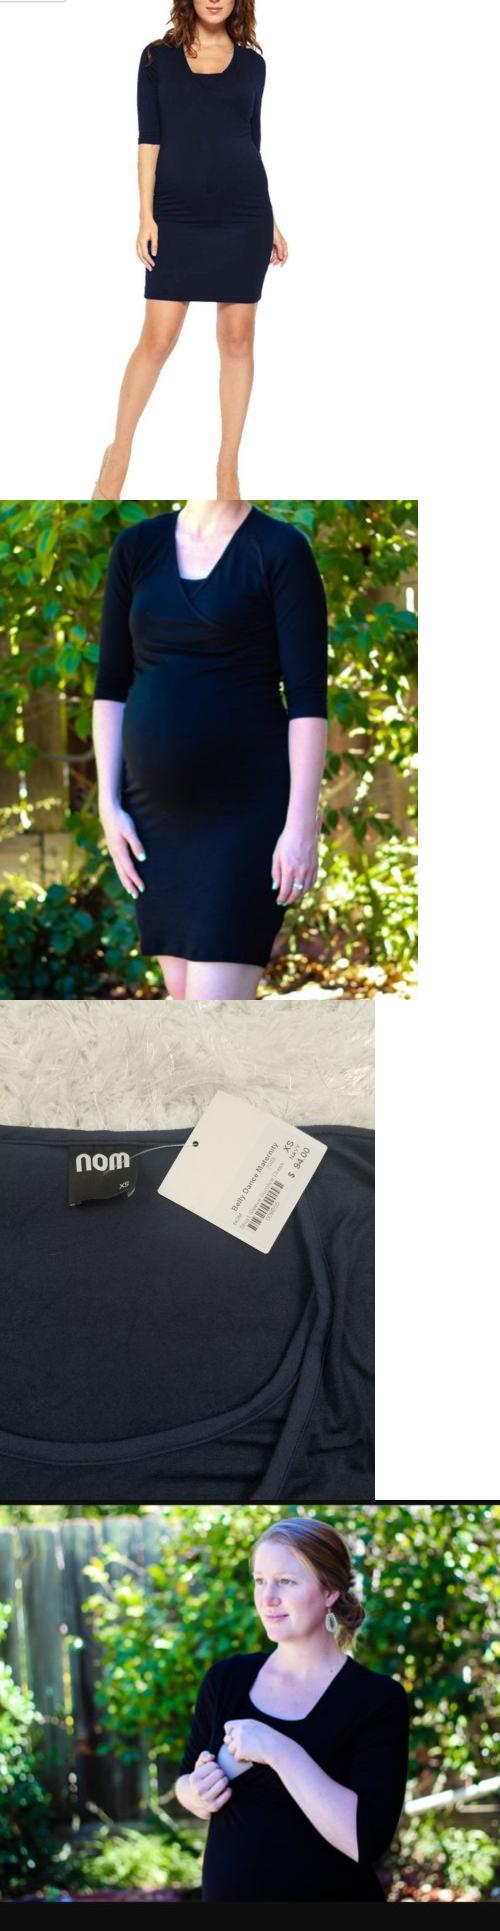 Dresses nom before and after maternity nursing dress sxs